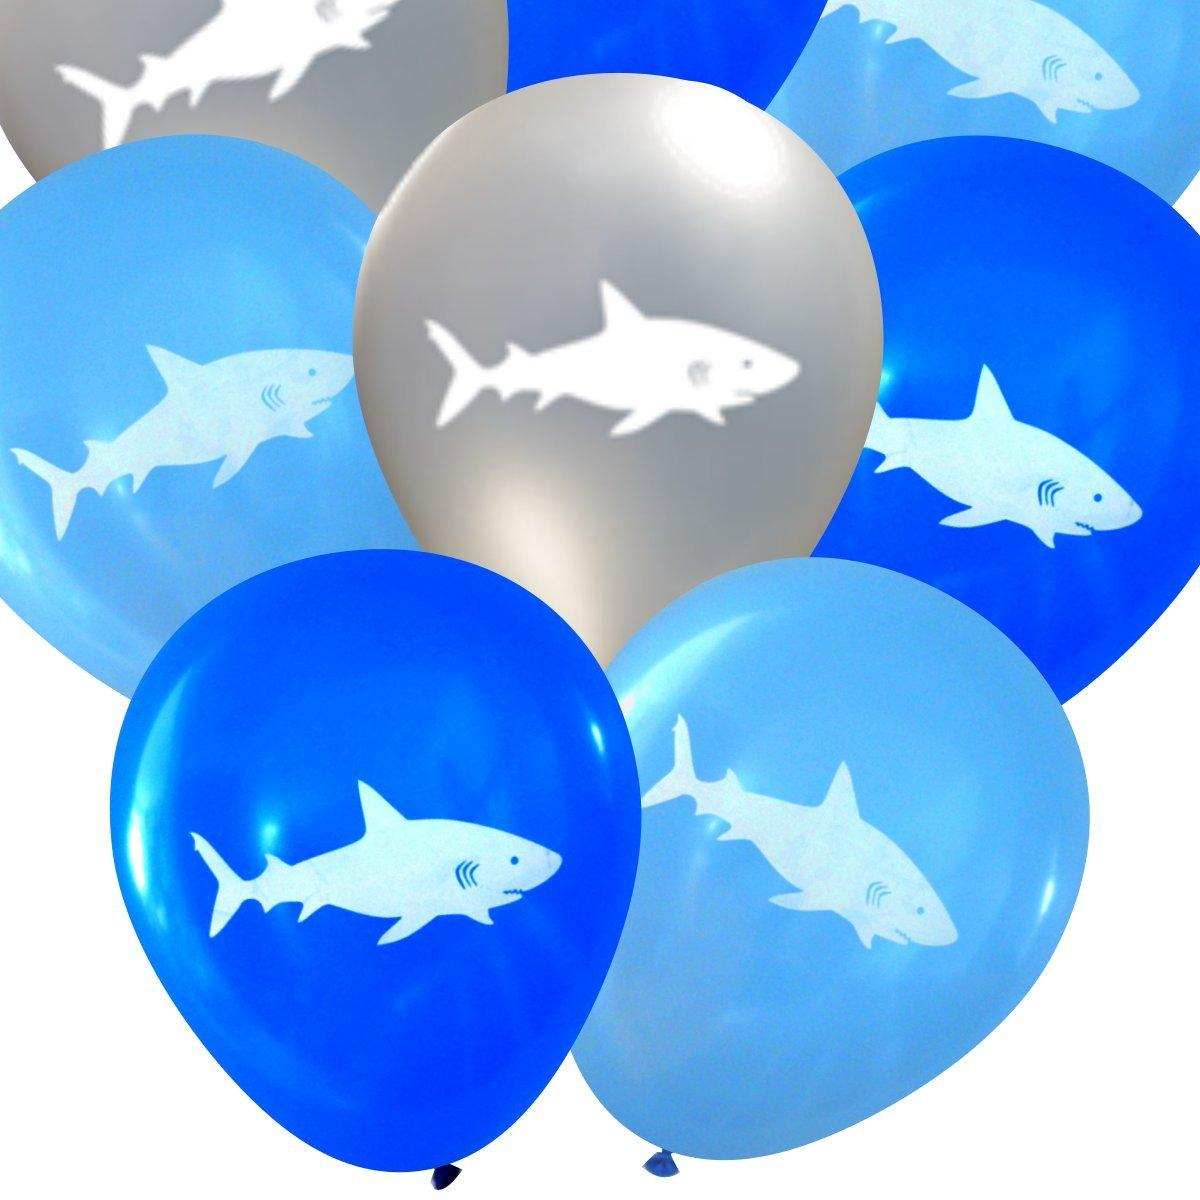 Shark Latex Balloons (16 pcs) by Nerdy Words (Blues & Silver)